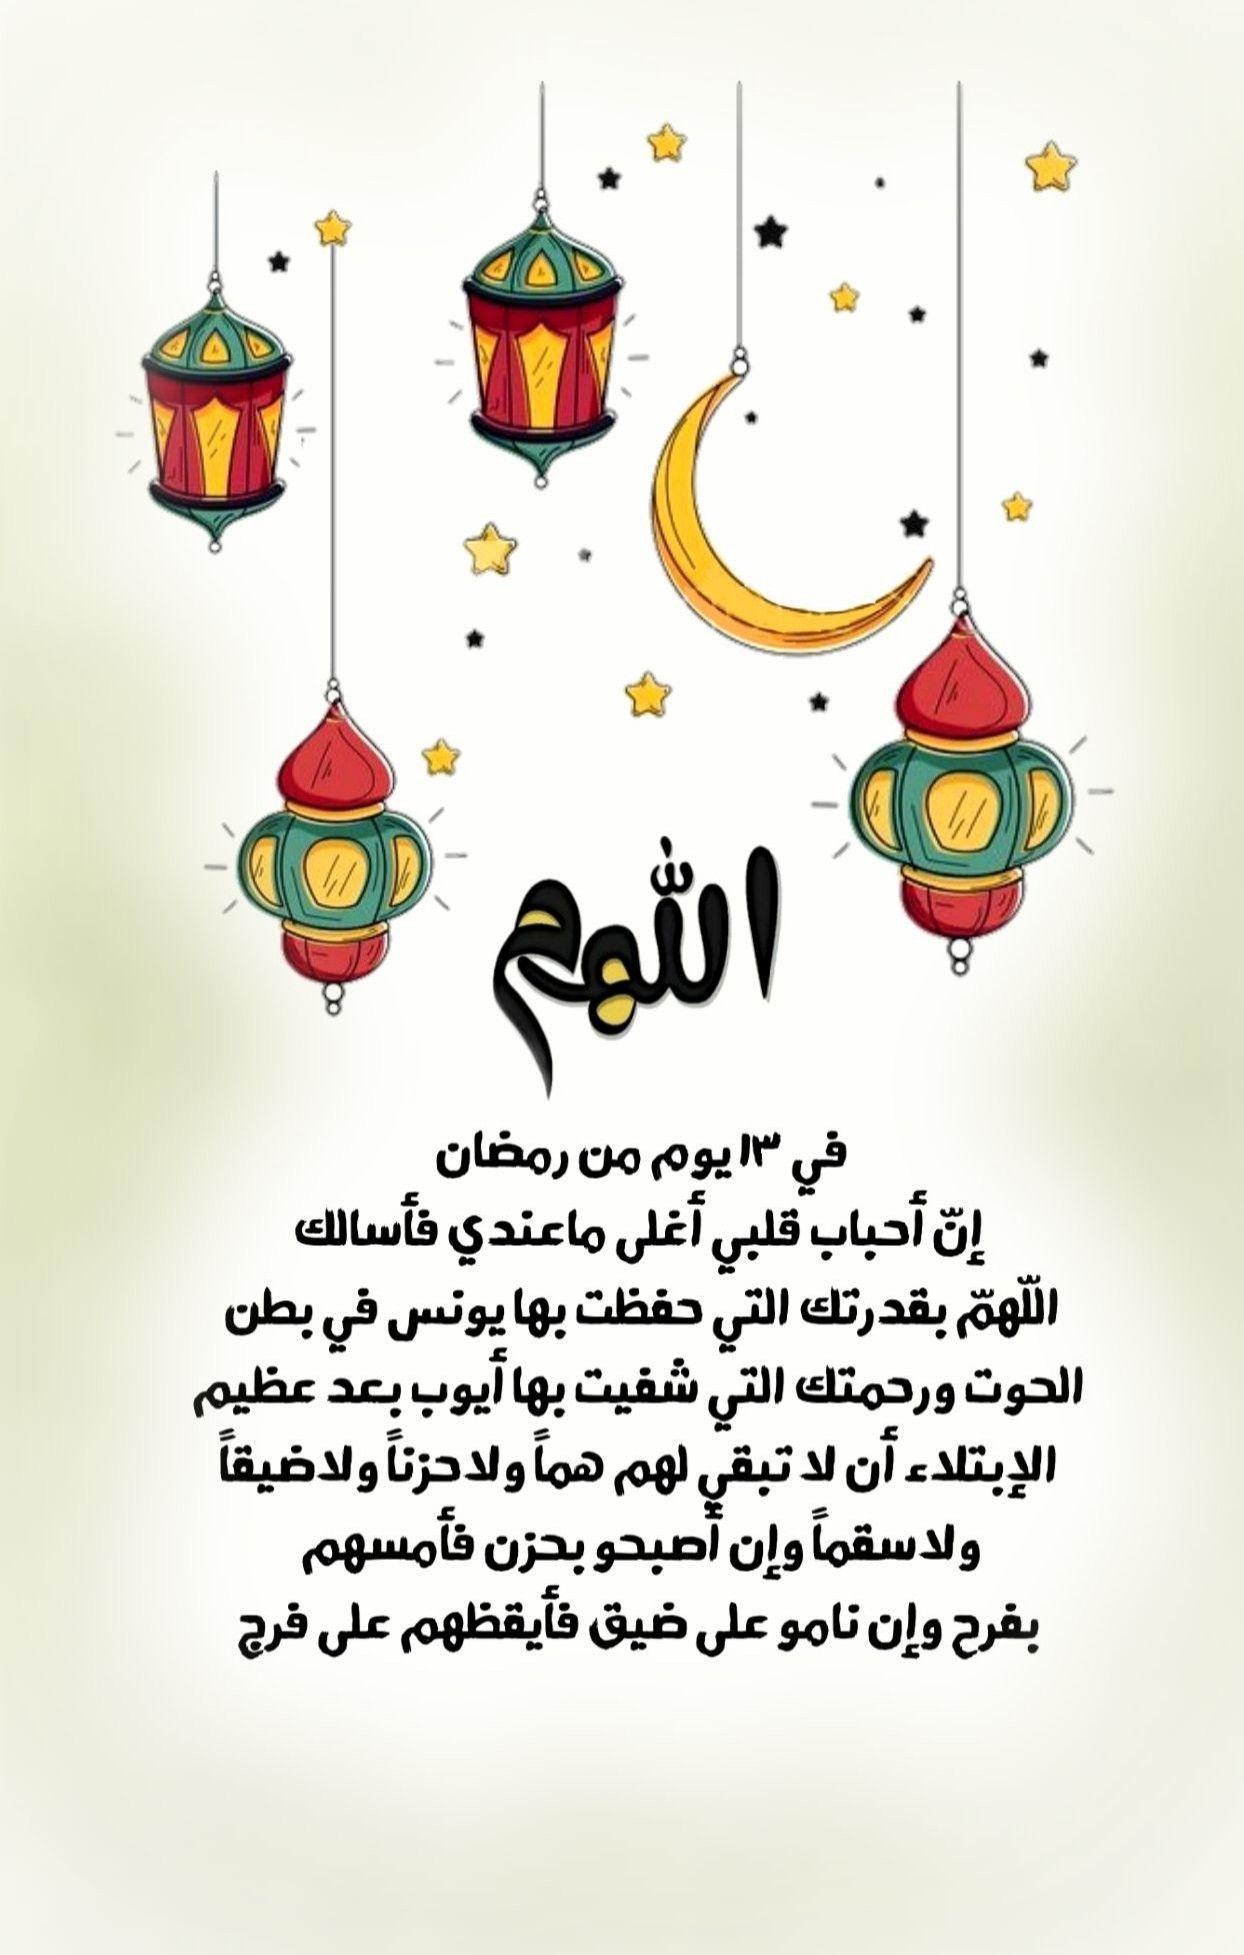 Pin By Amena Altaie On دعاء و حكمه Ramadan Ramadan Kareem Ramadan Mubarak